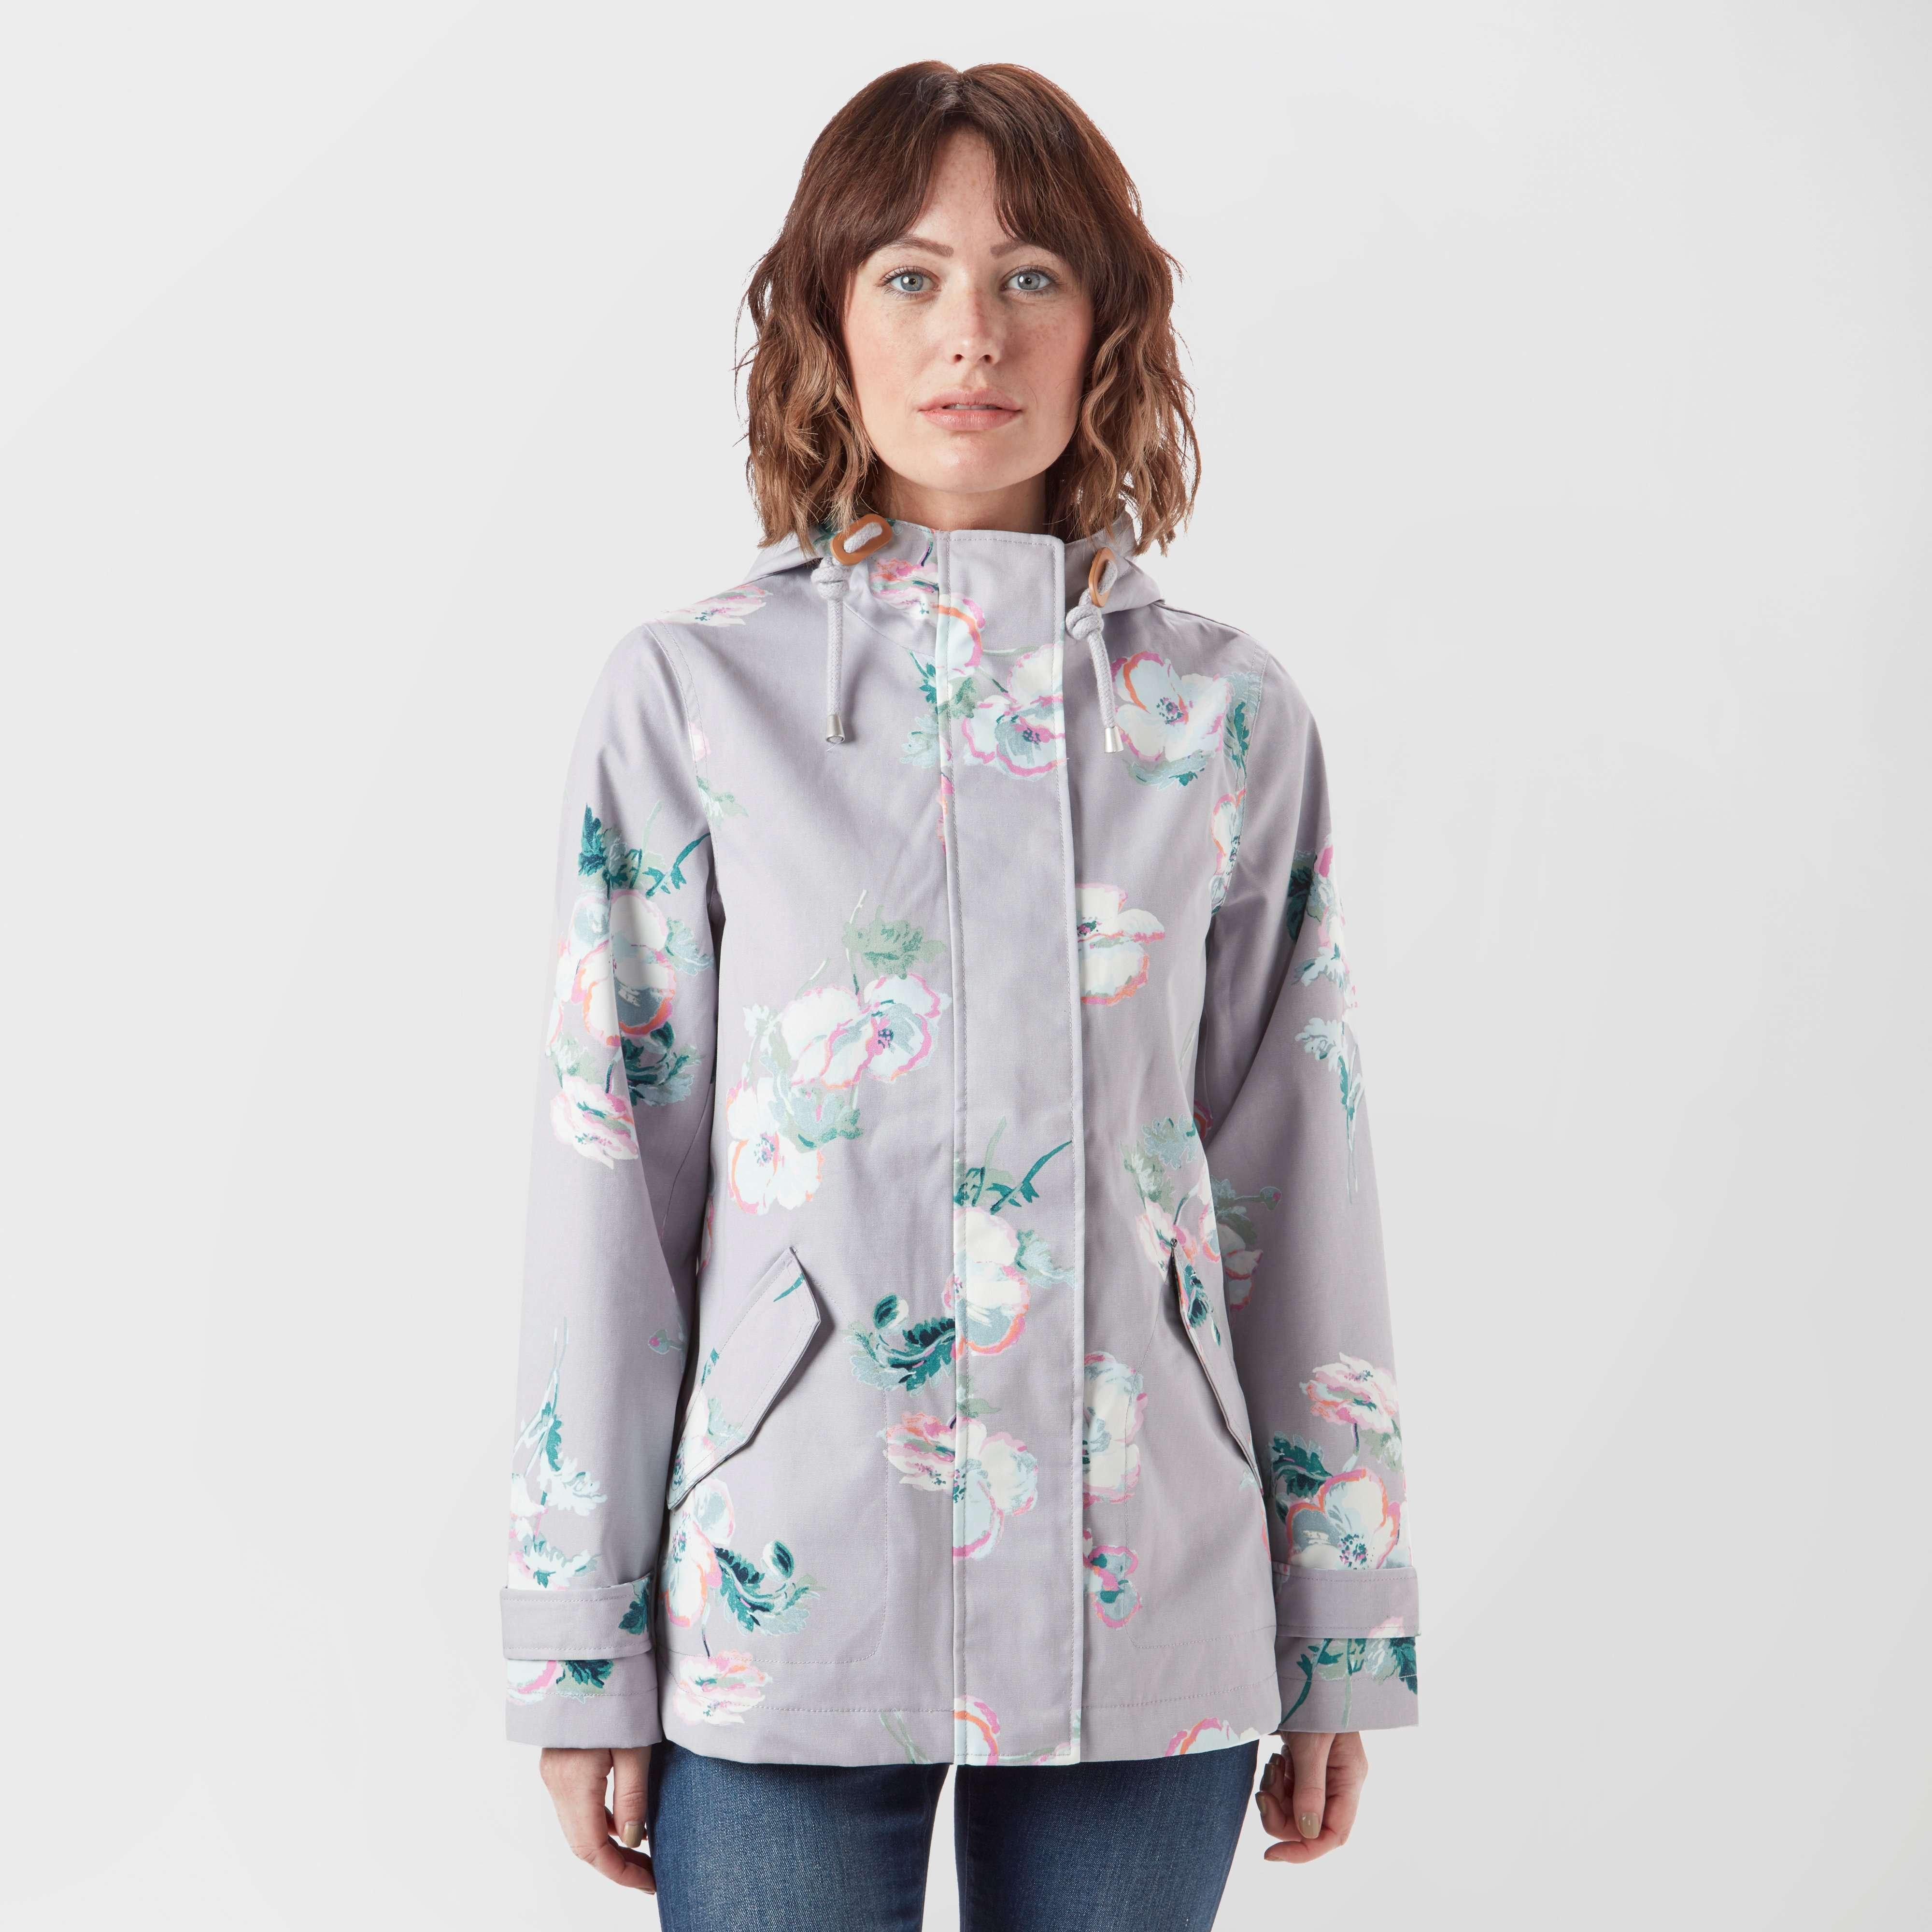 JOULES Women's Coast Printed Jacket